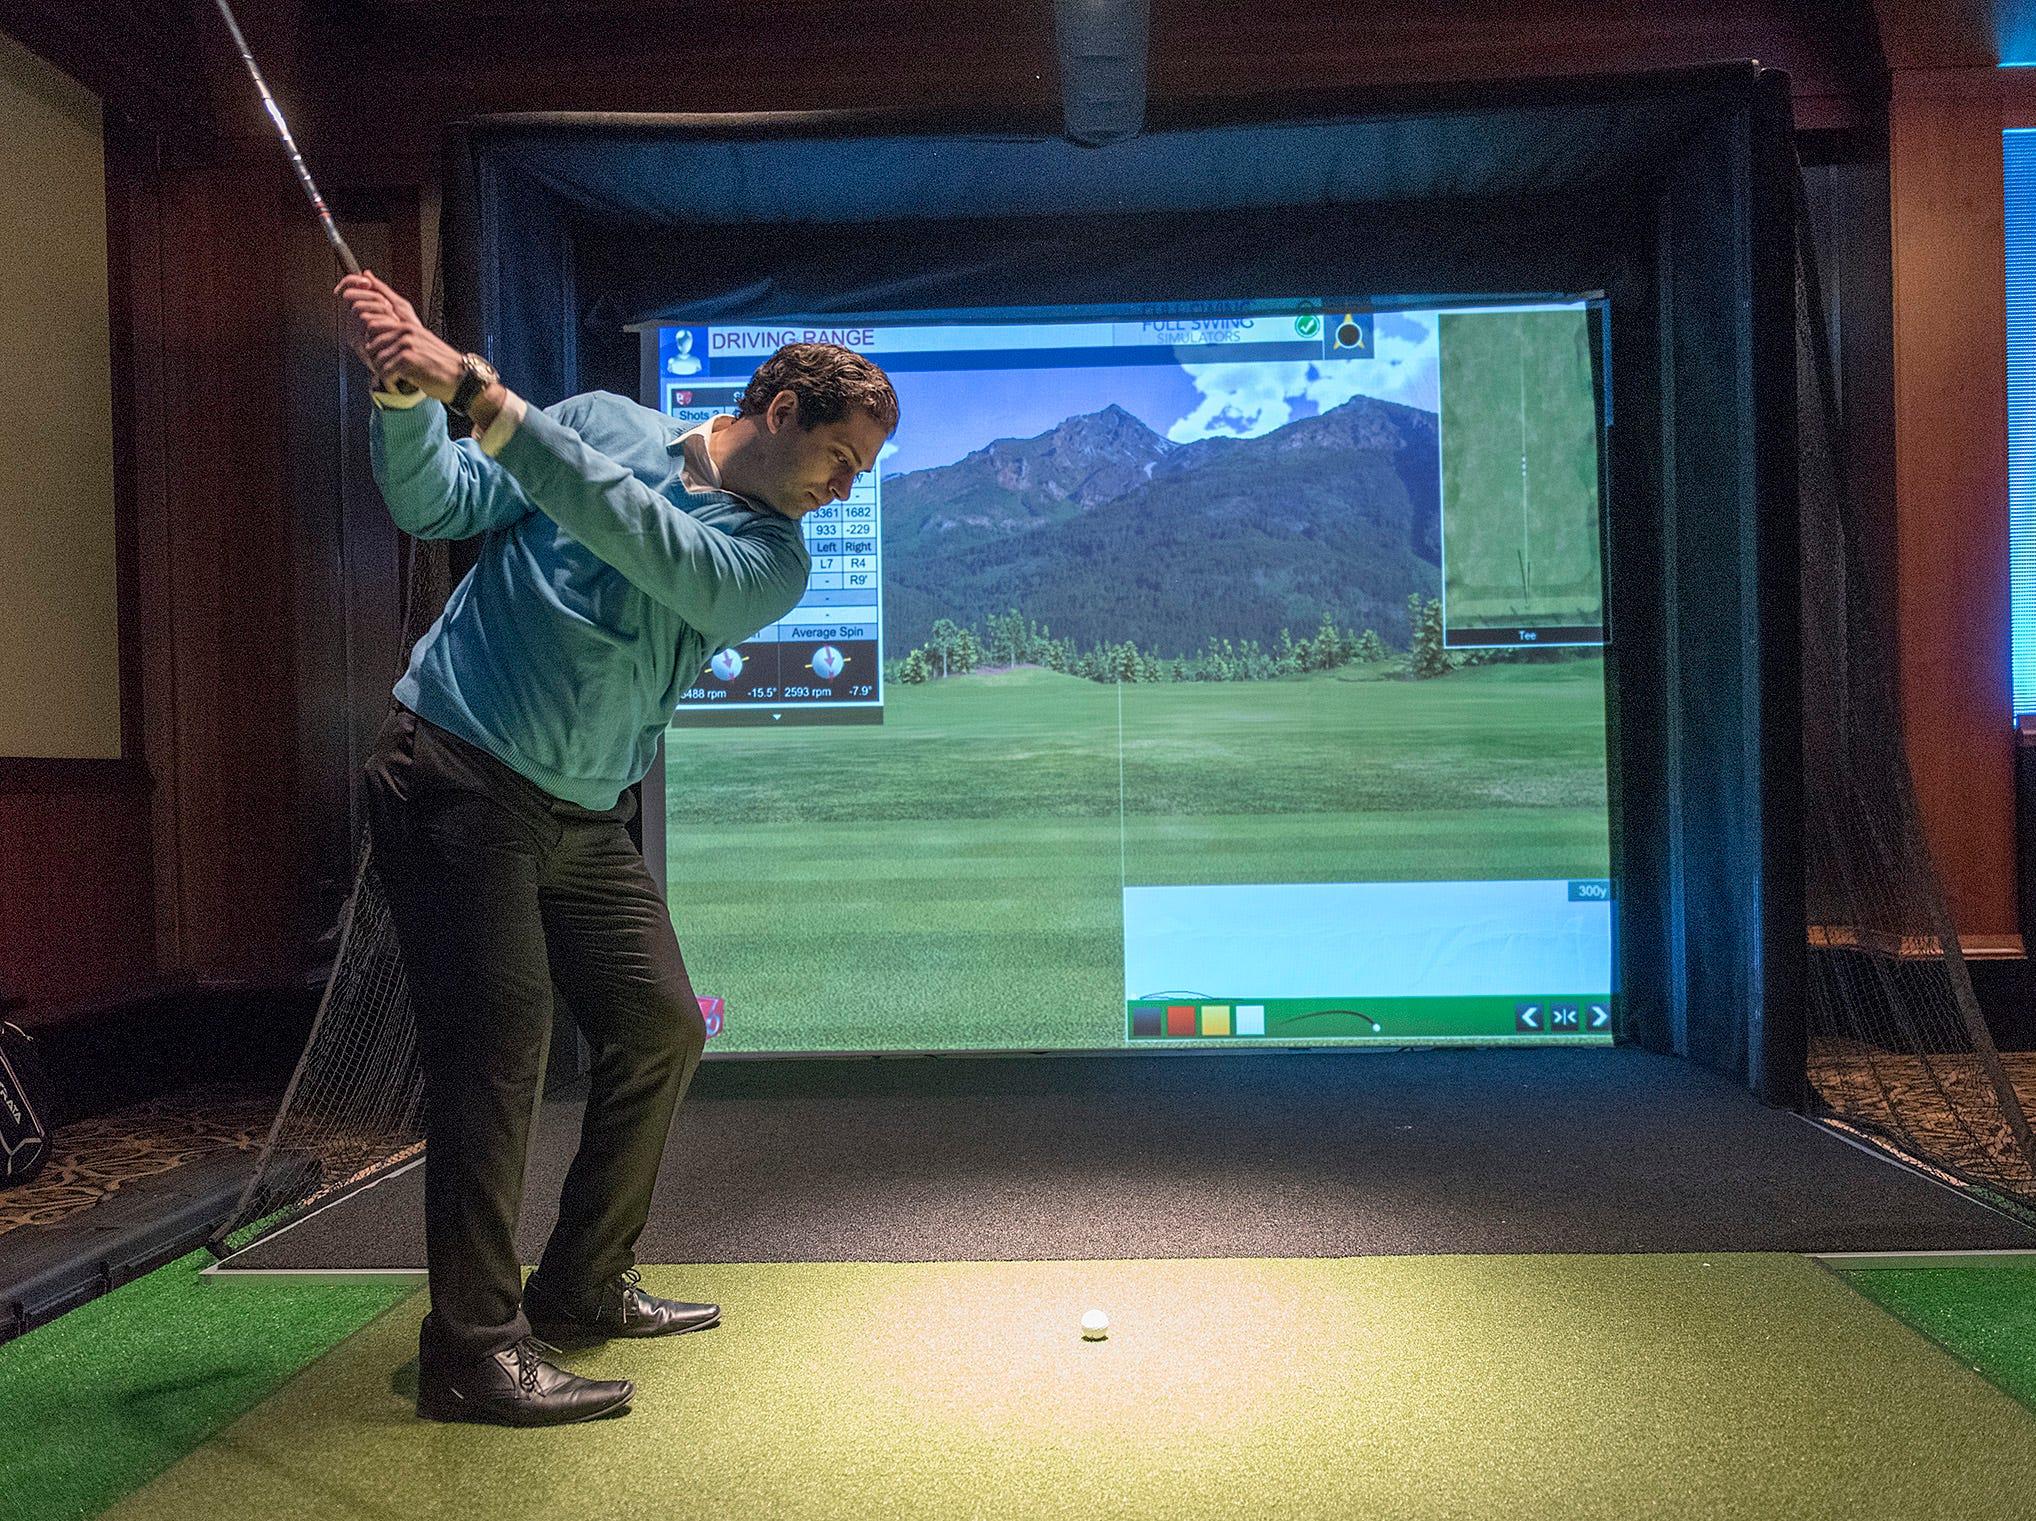 Sam Mass takes a swing at the golf simulator.